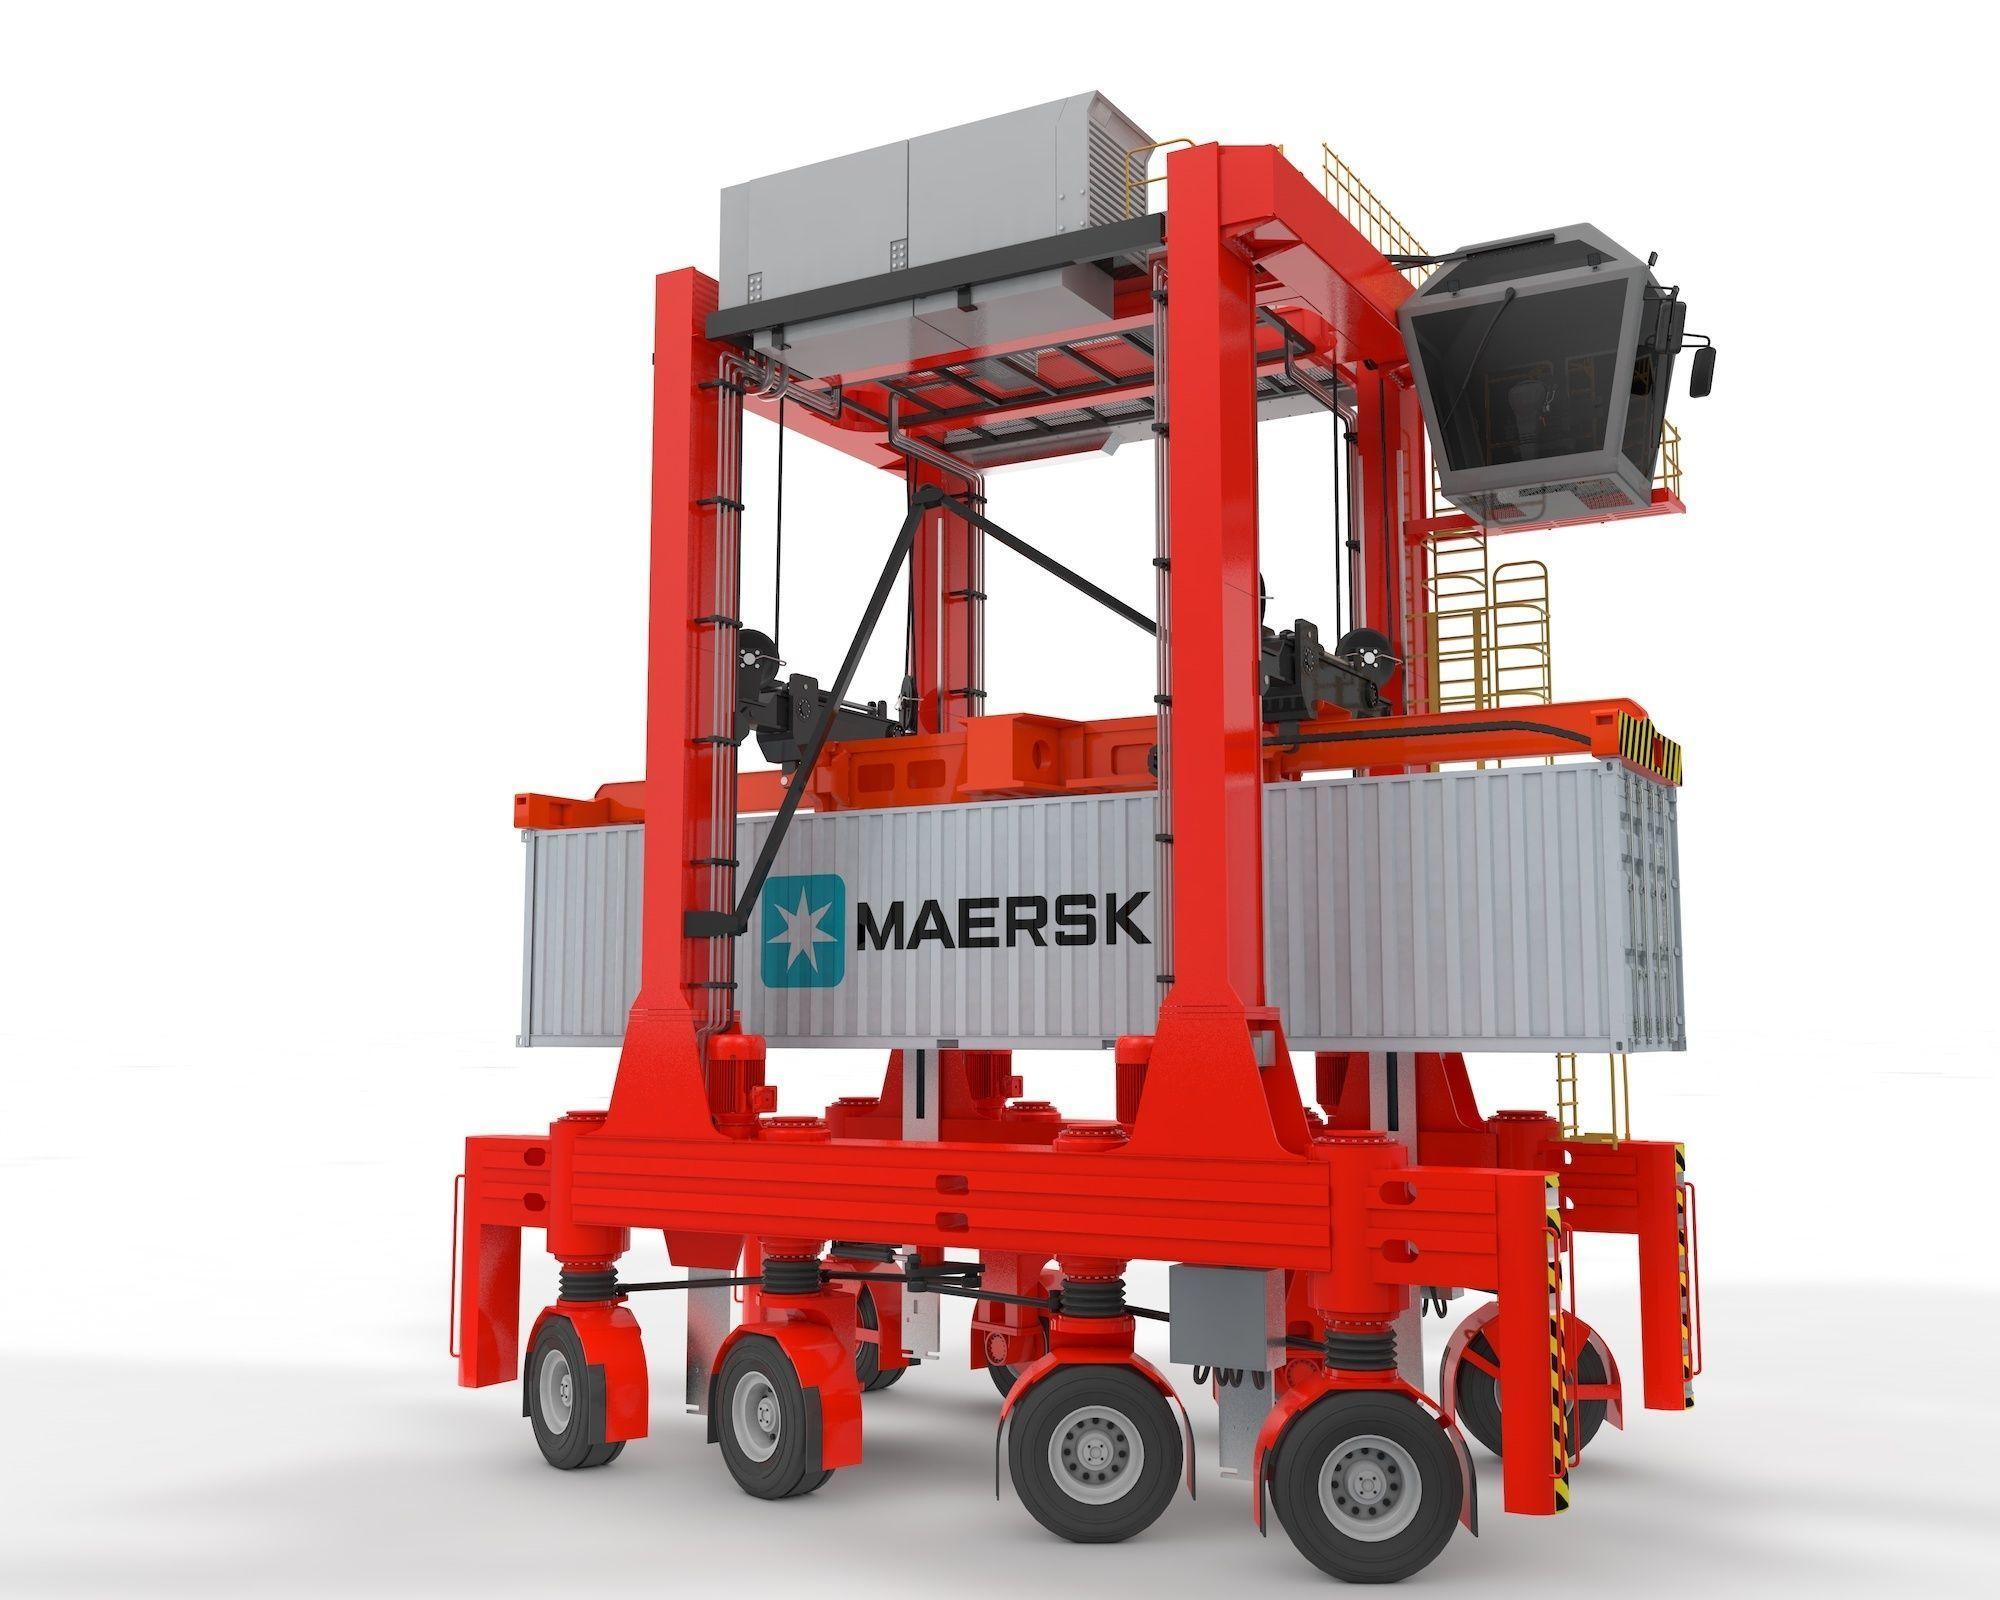 Straddle Carrier for Port